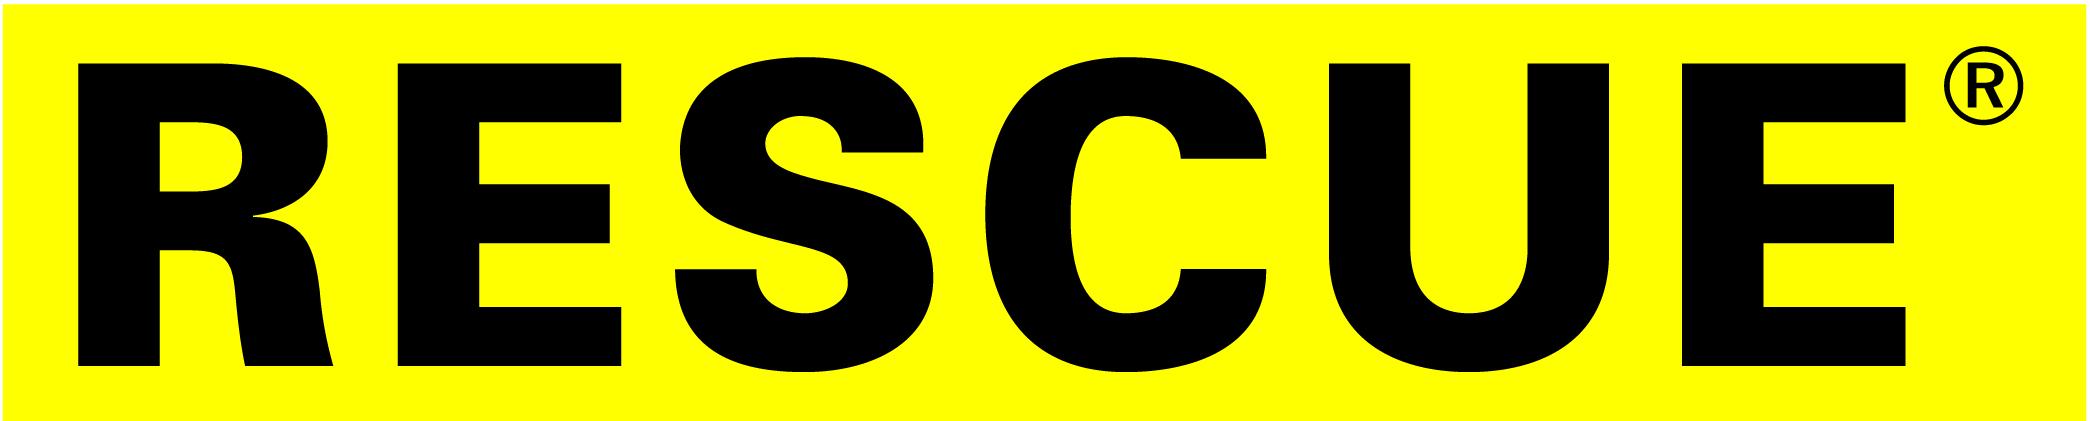 Rescue logo.jpg